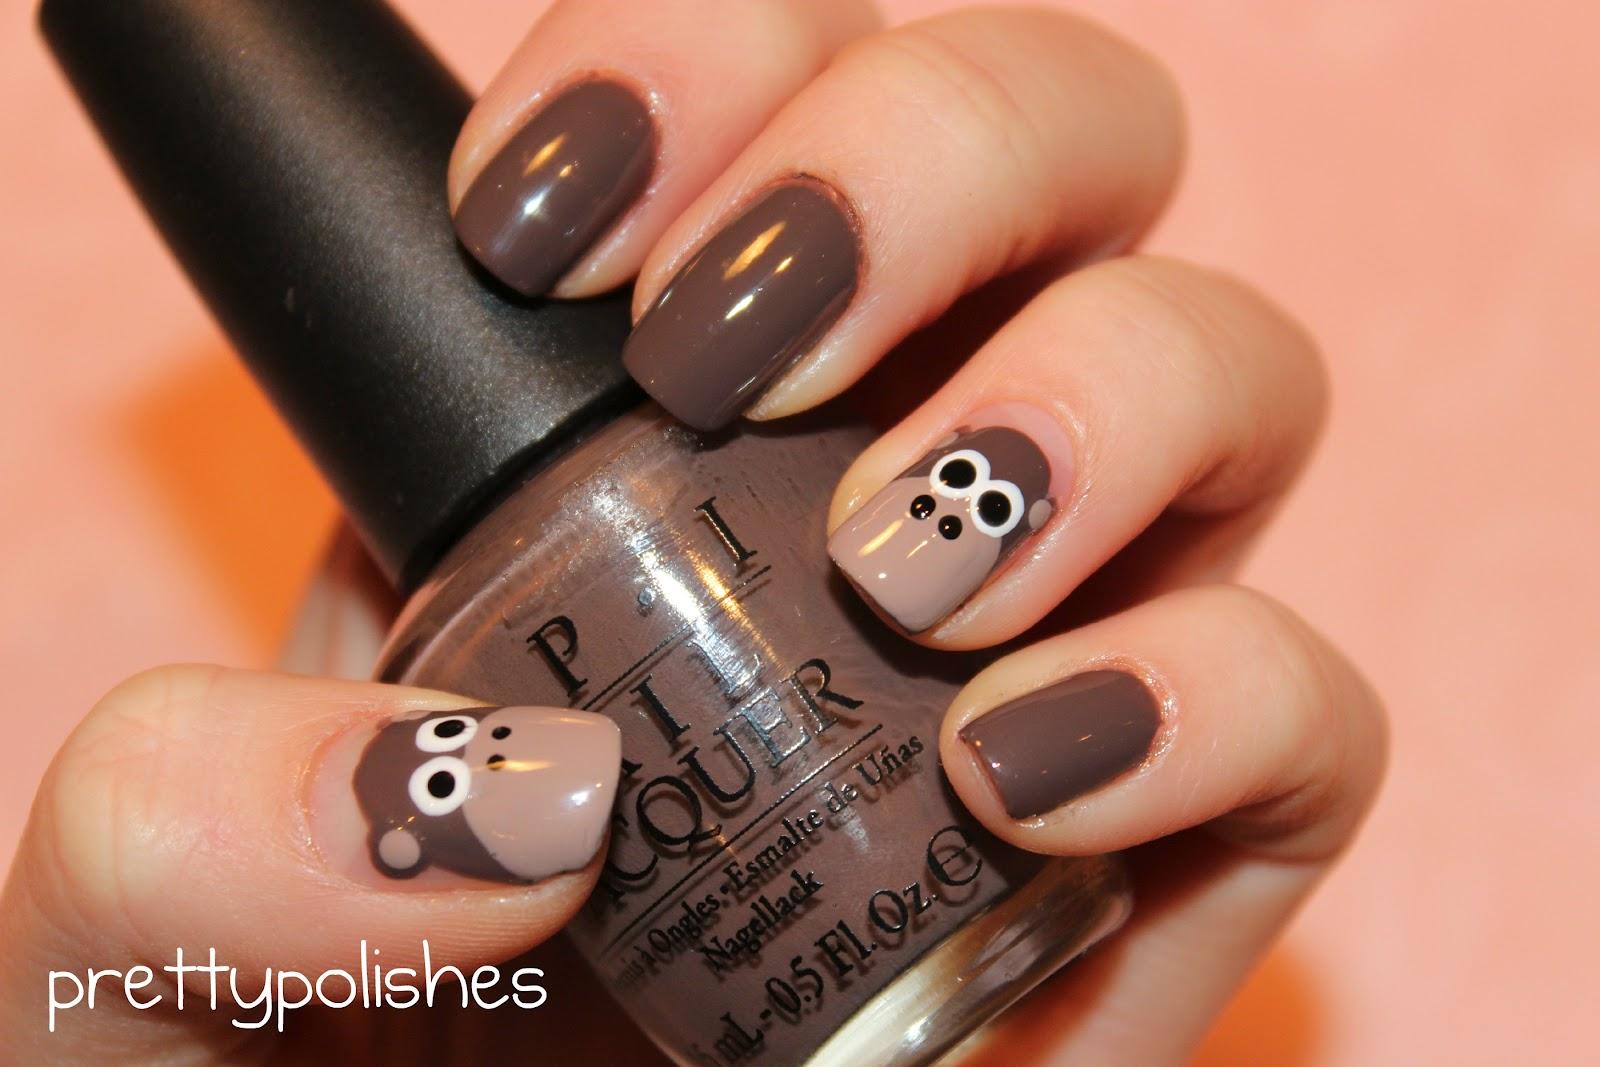 prettypolishes: Monkey Nails!